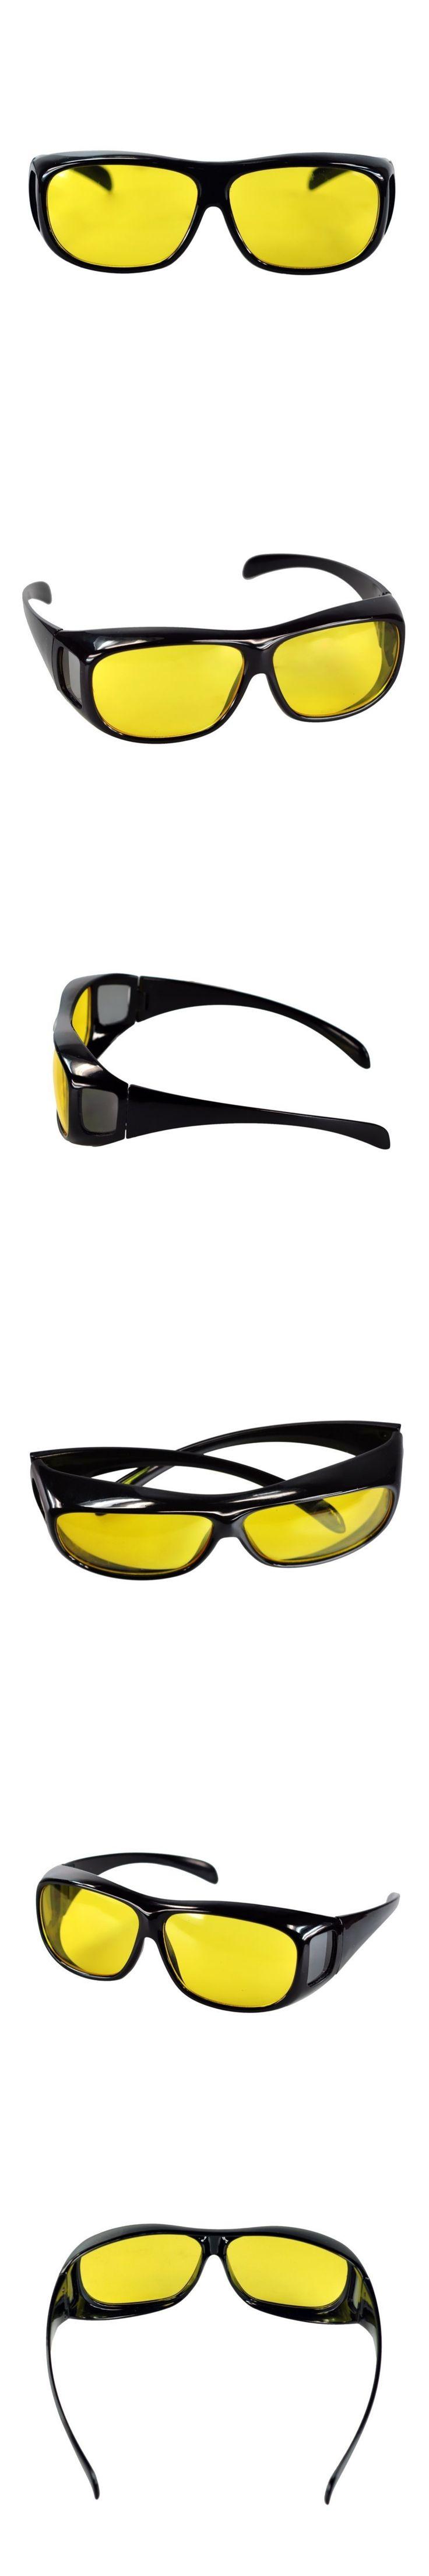 S9005 Eyekepper AC Yellow Night Vision Wraparounds Wrap Around Glasses